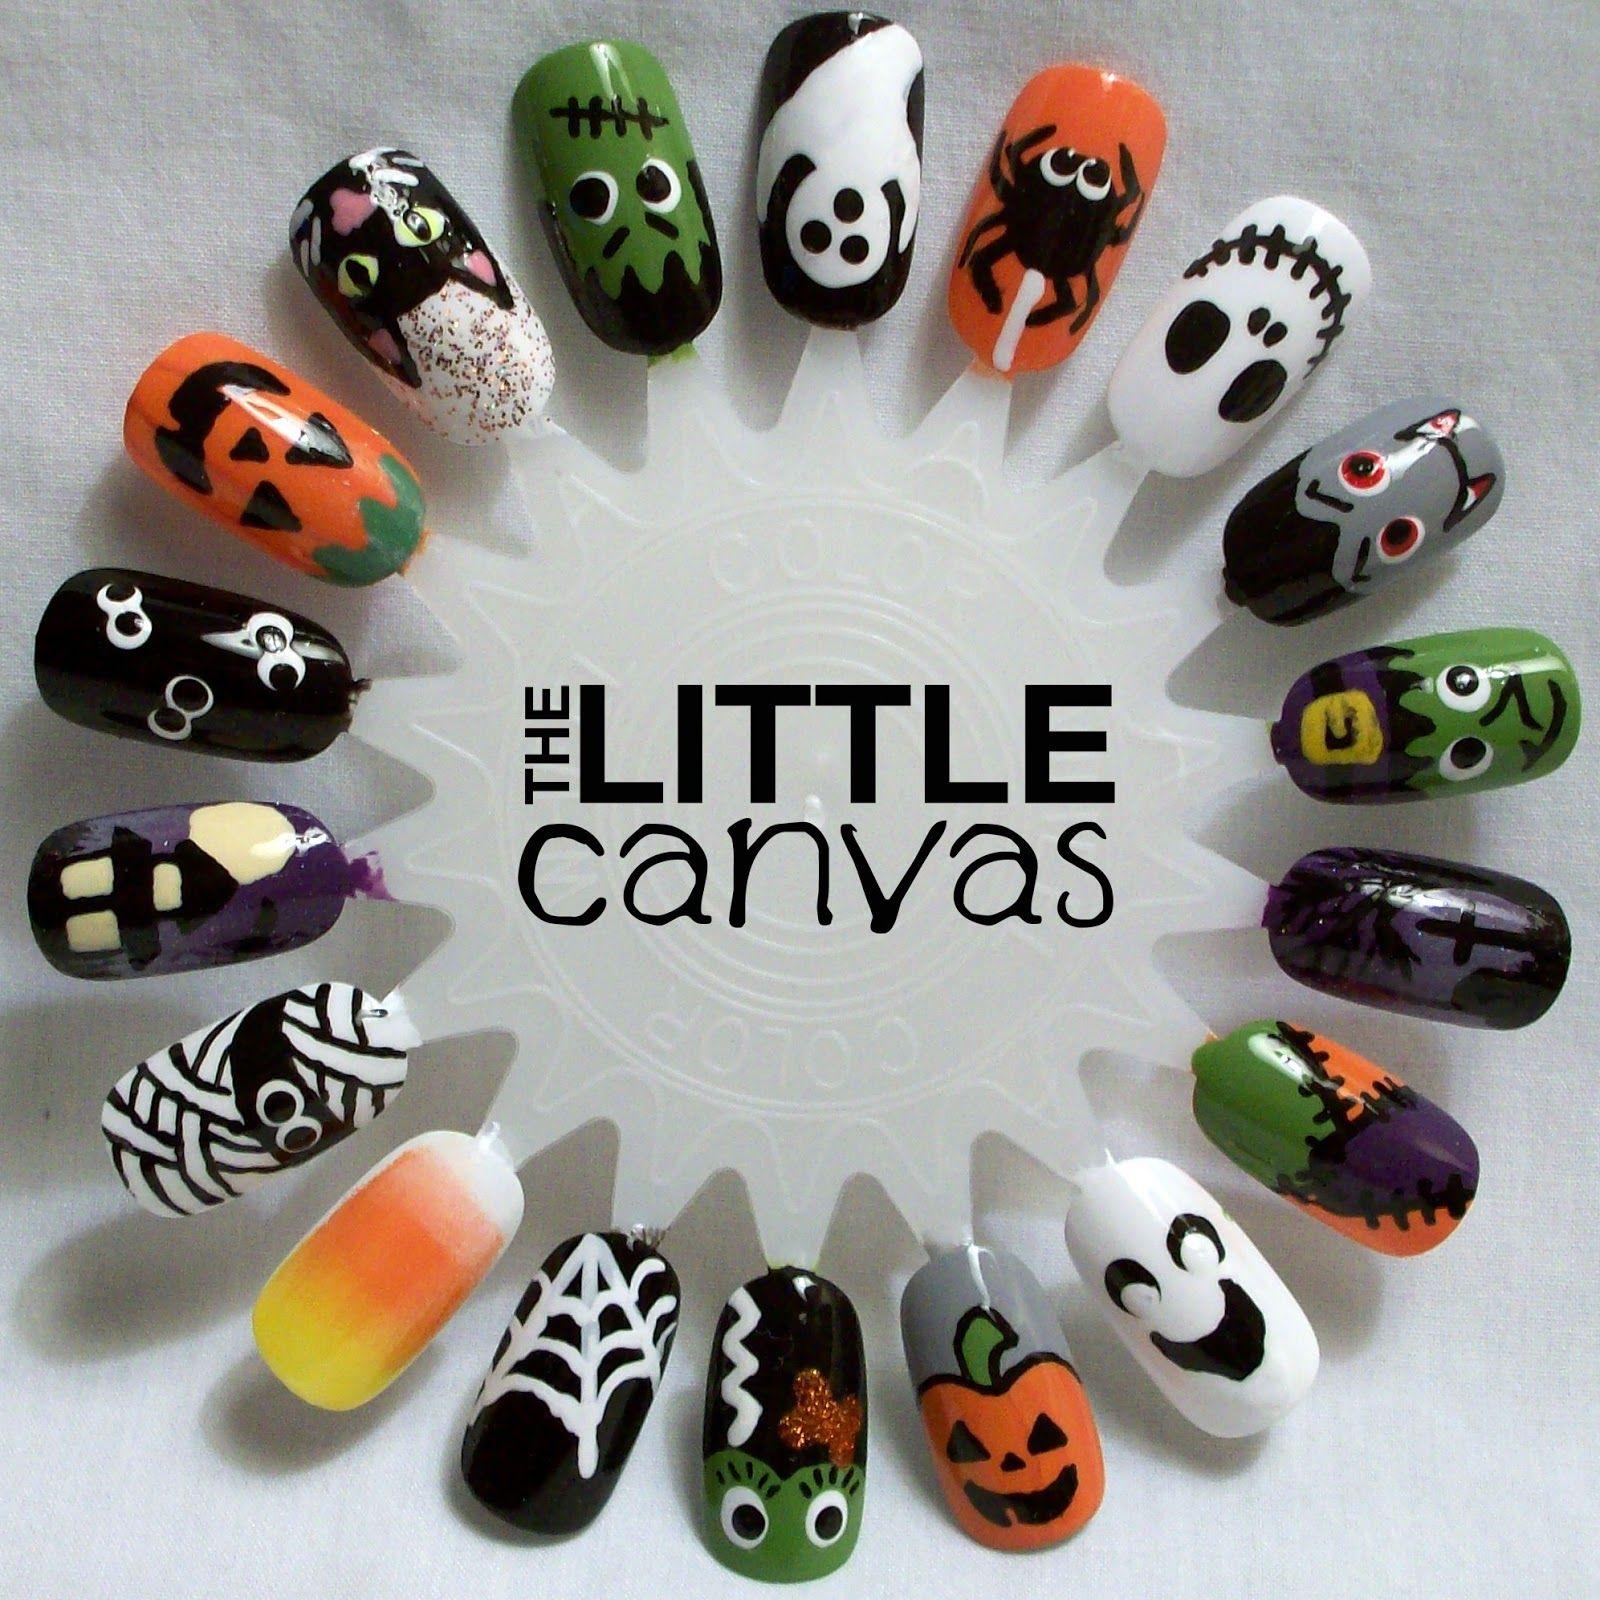 The Little Canvas: Halloween Nail Art Wheel (The Little Canvas)